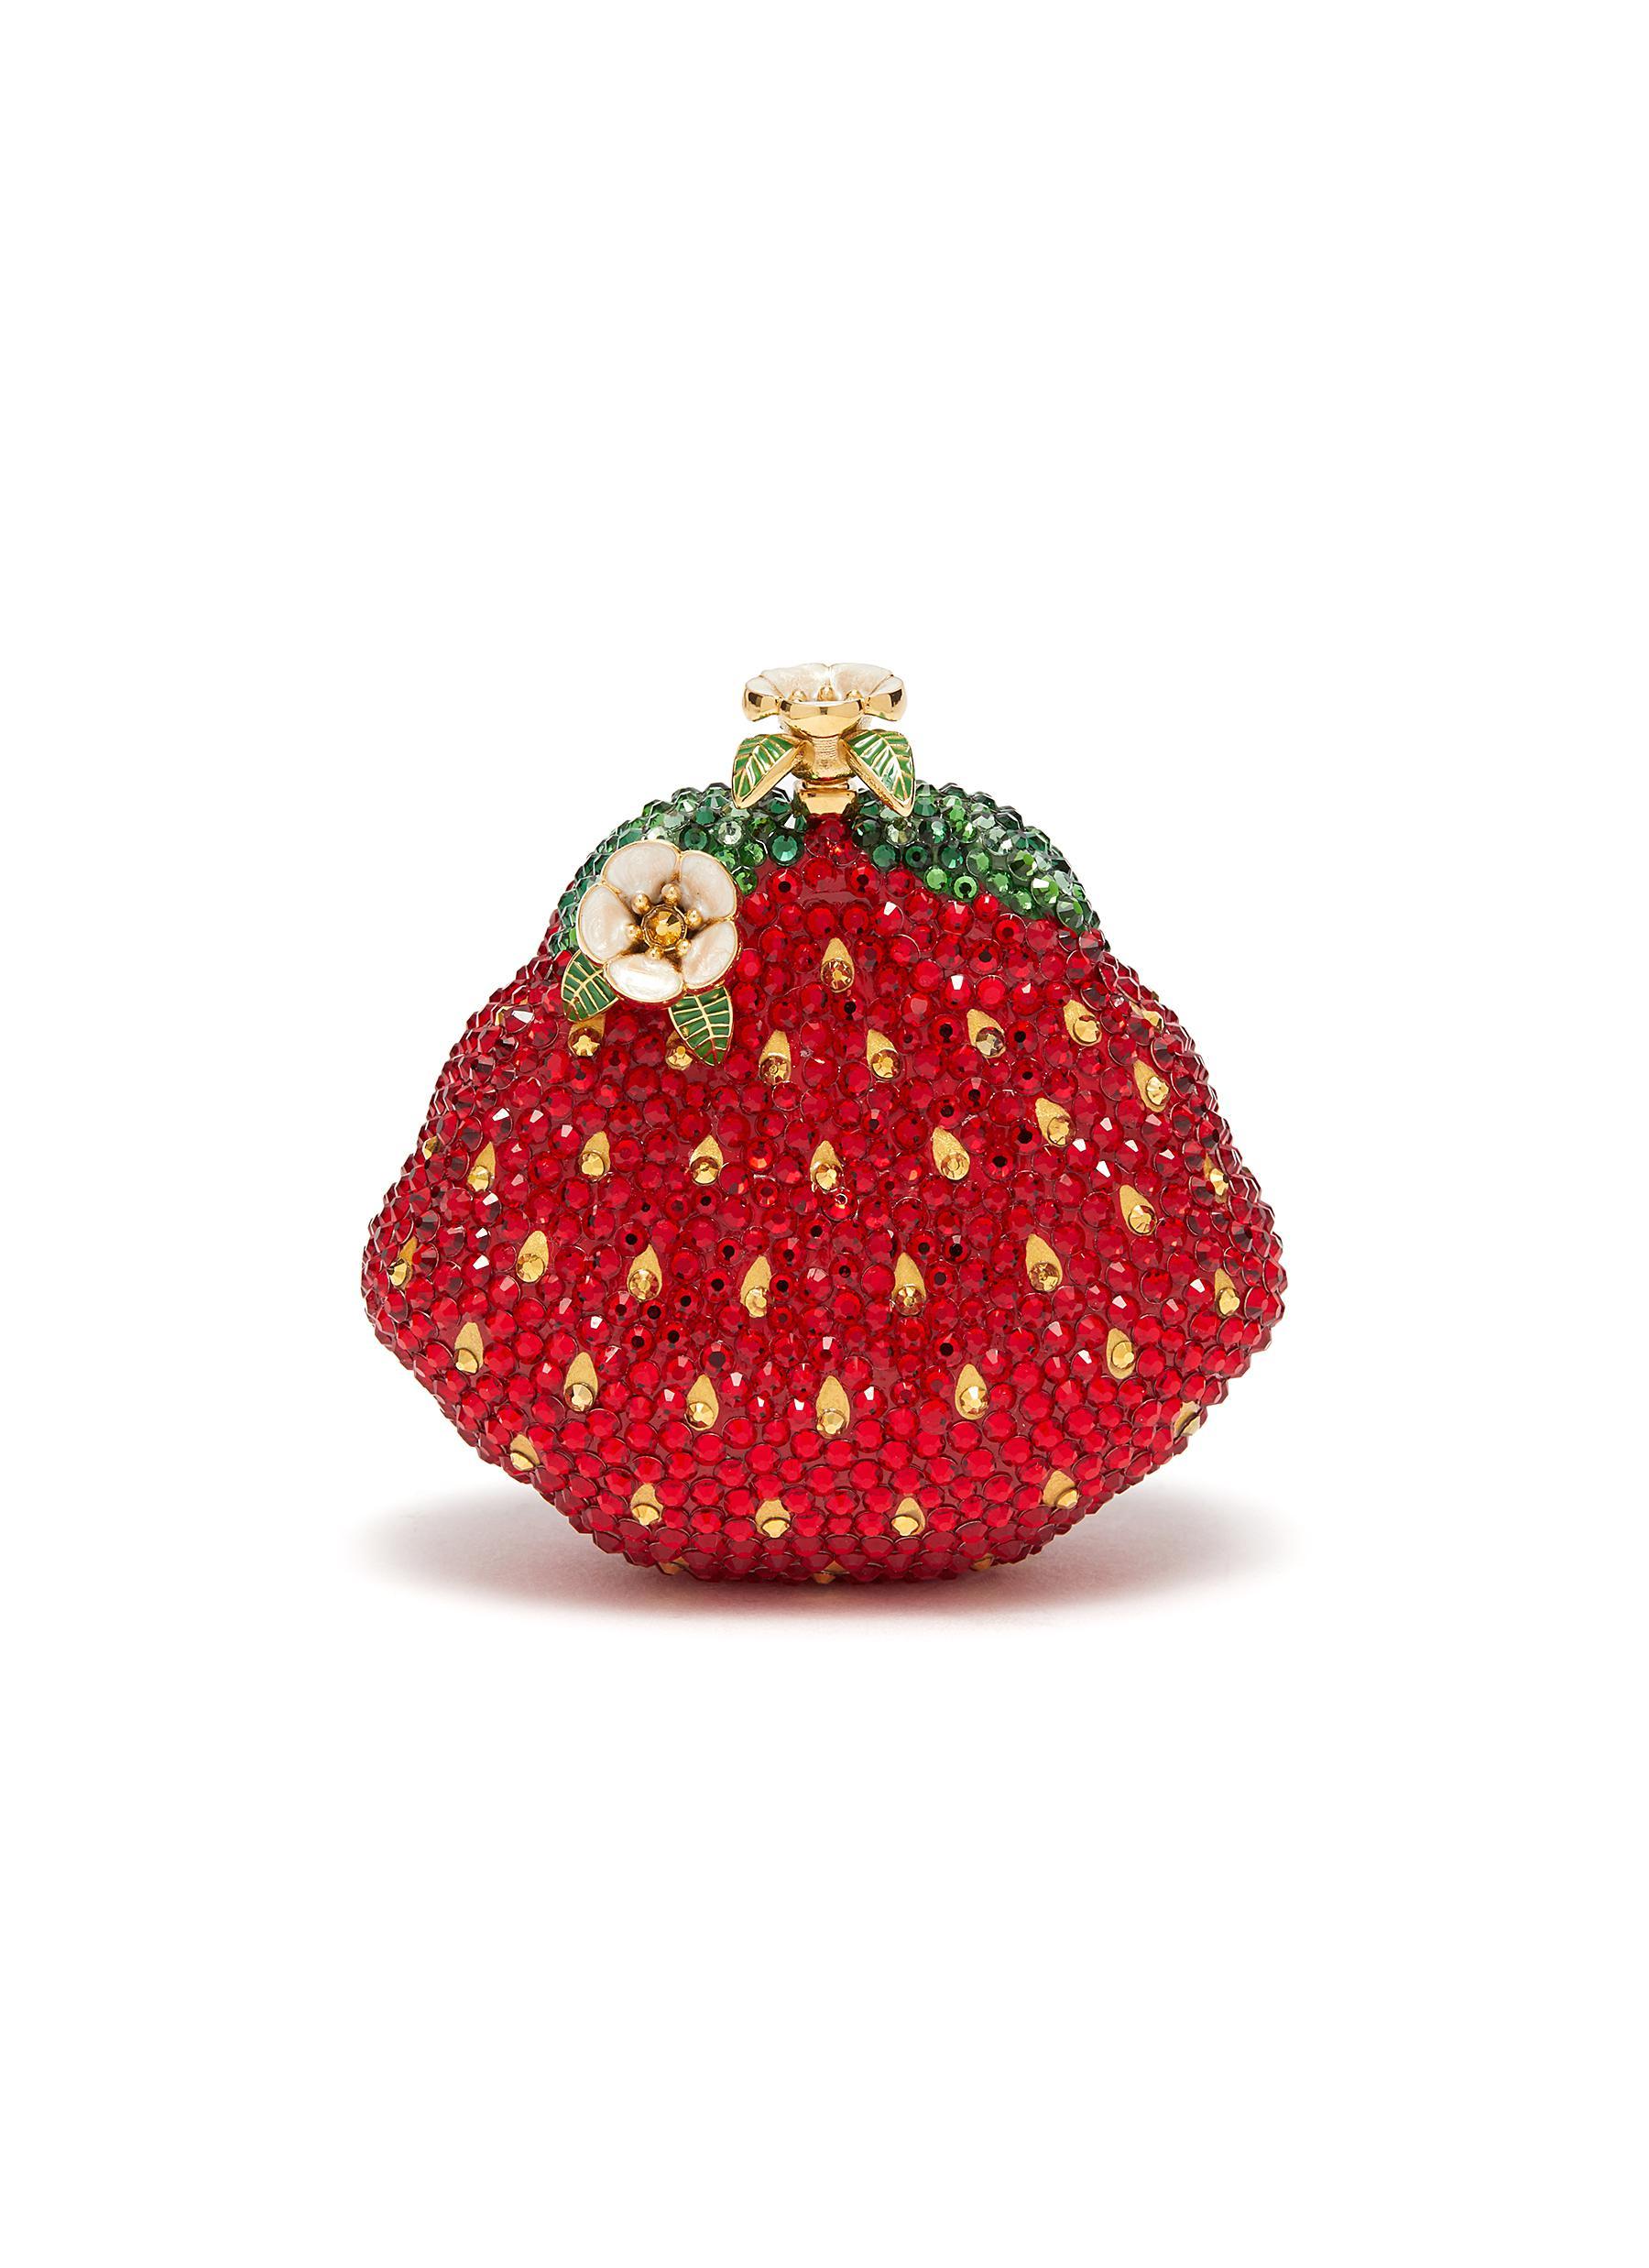 Strawberry Rhinestone Clutch